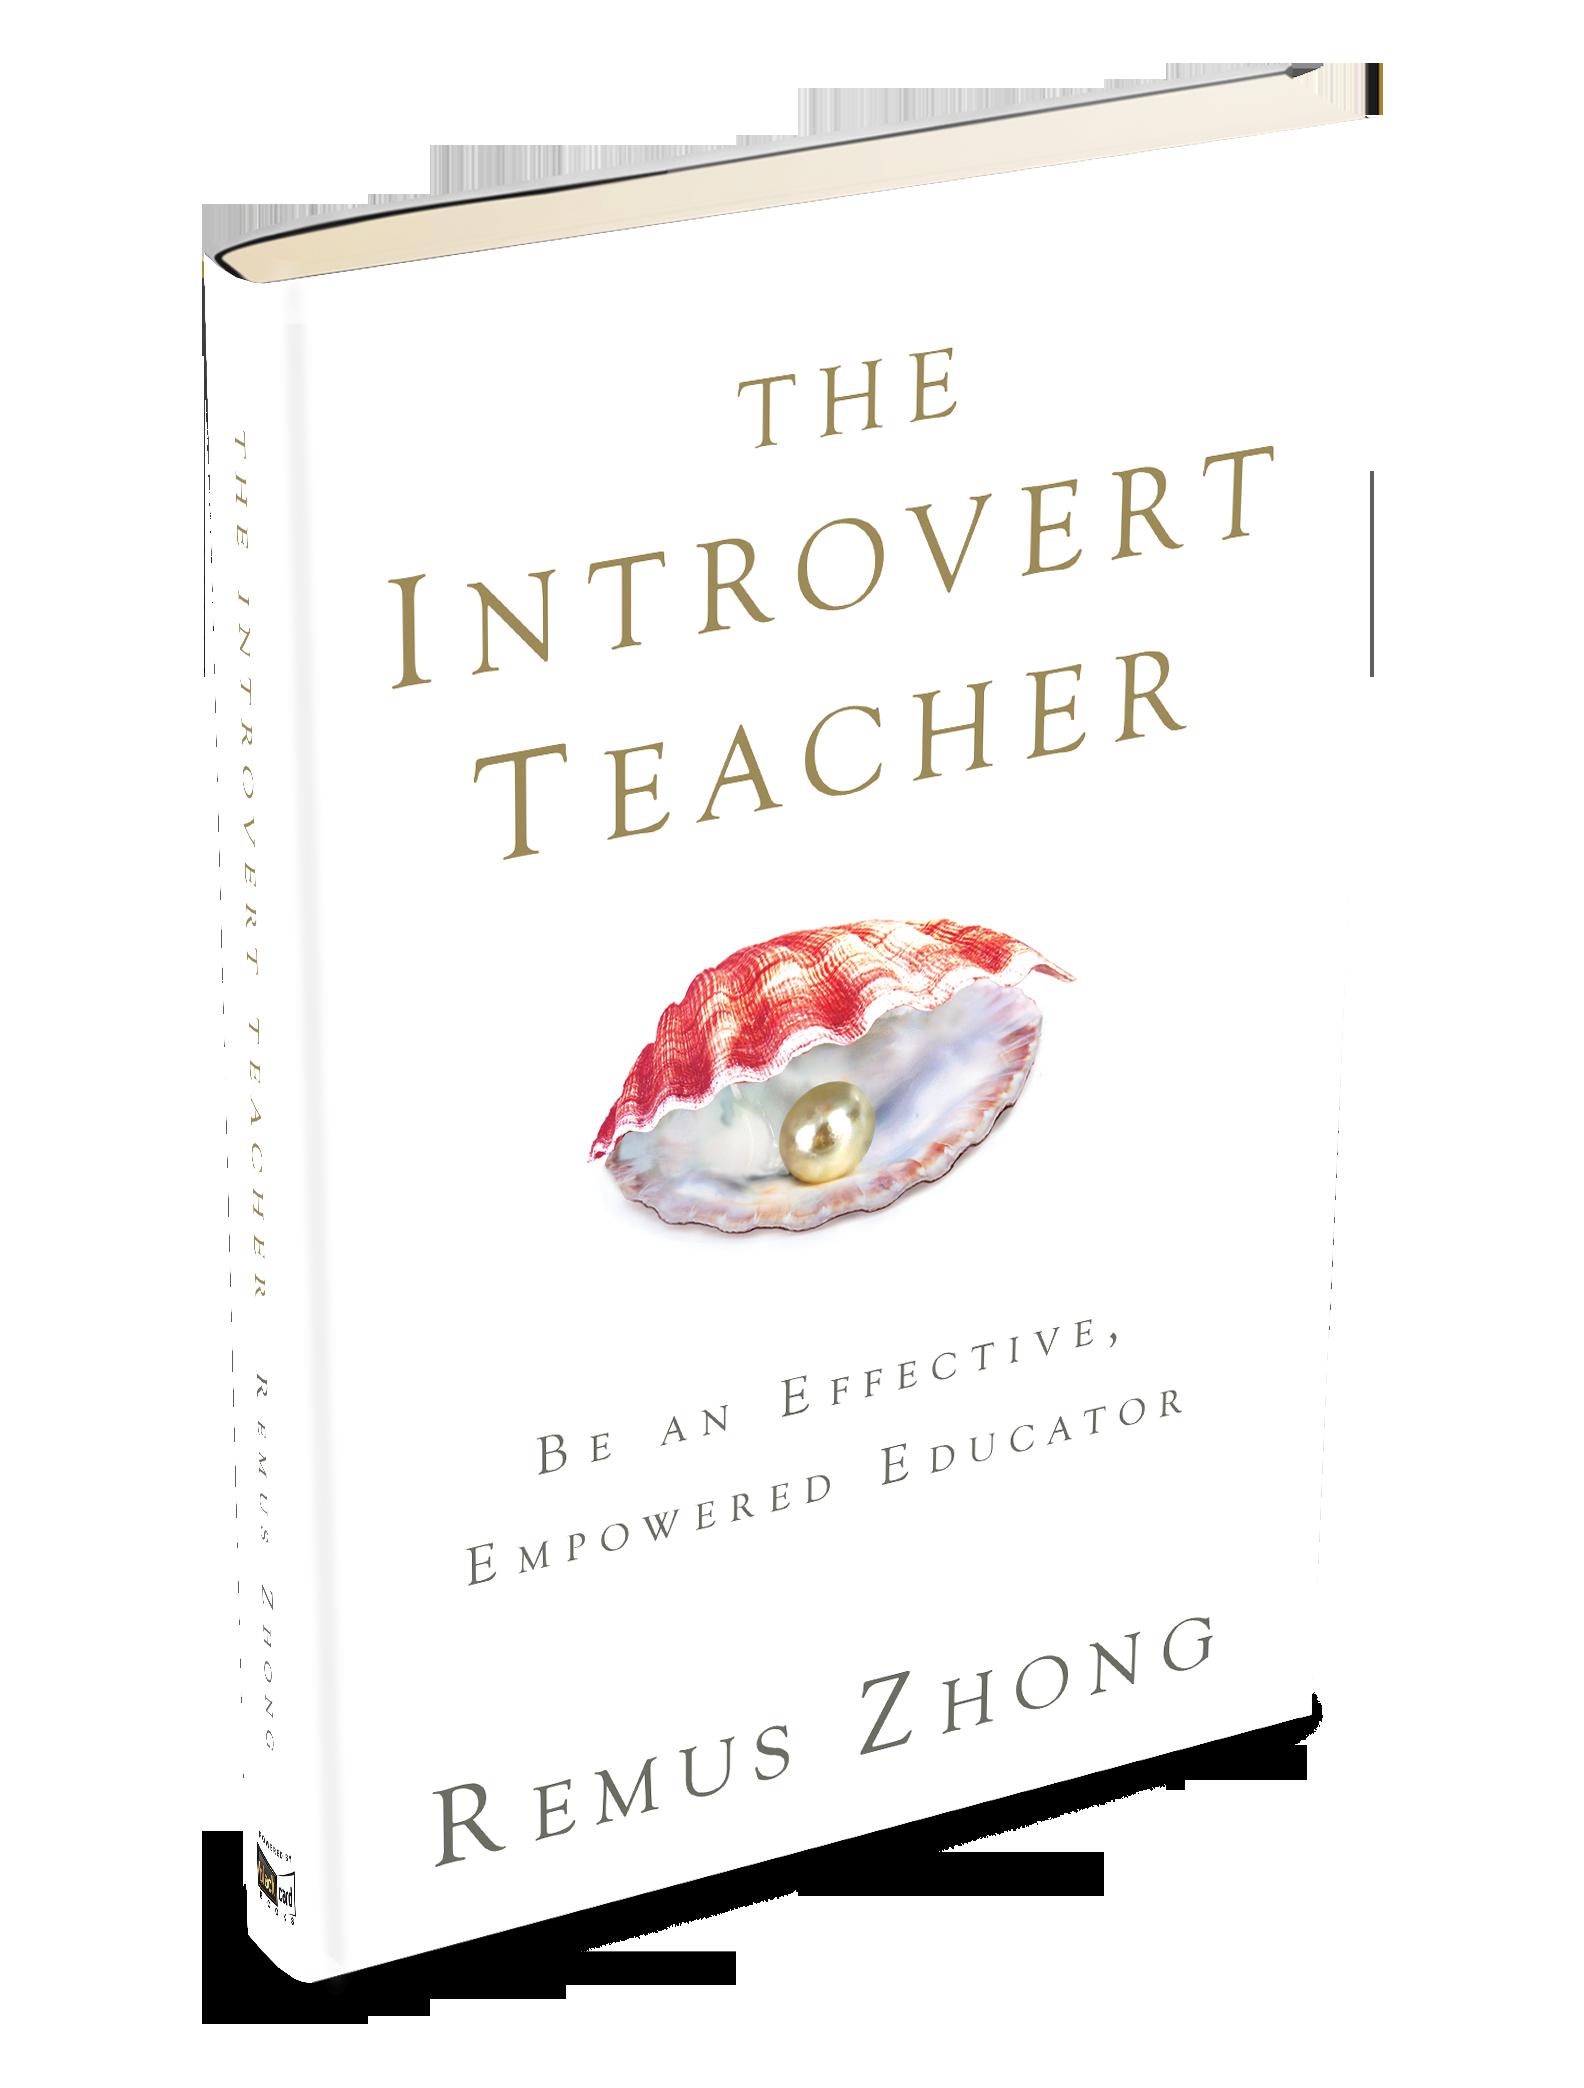 The Introvert Teacher Book Cover